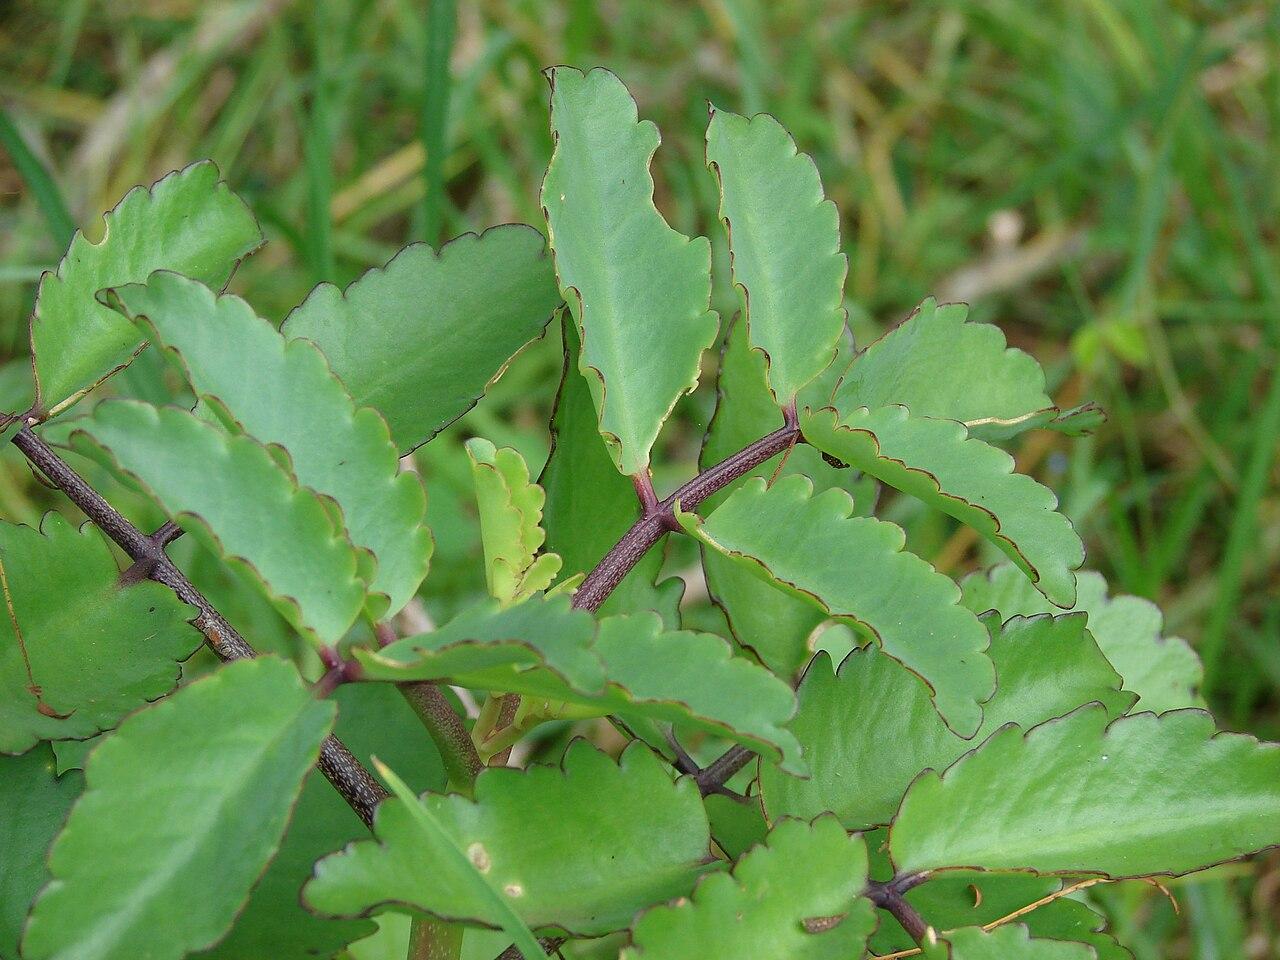 las hojas de kalanchoe pinnata mostró actividad antibacteriana 3 4 Kalanchoe Pinnata